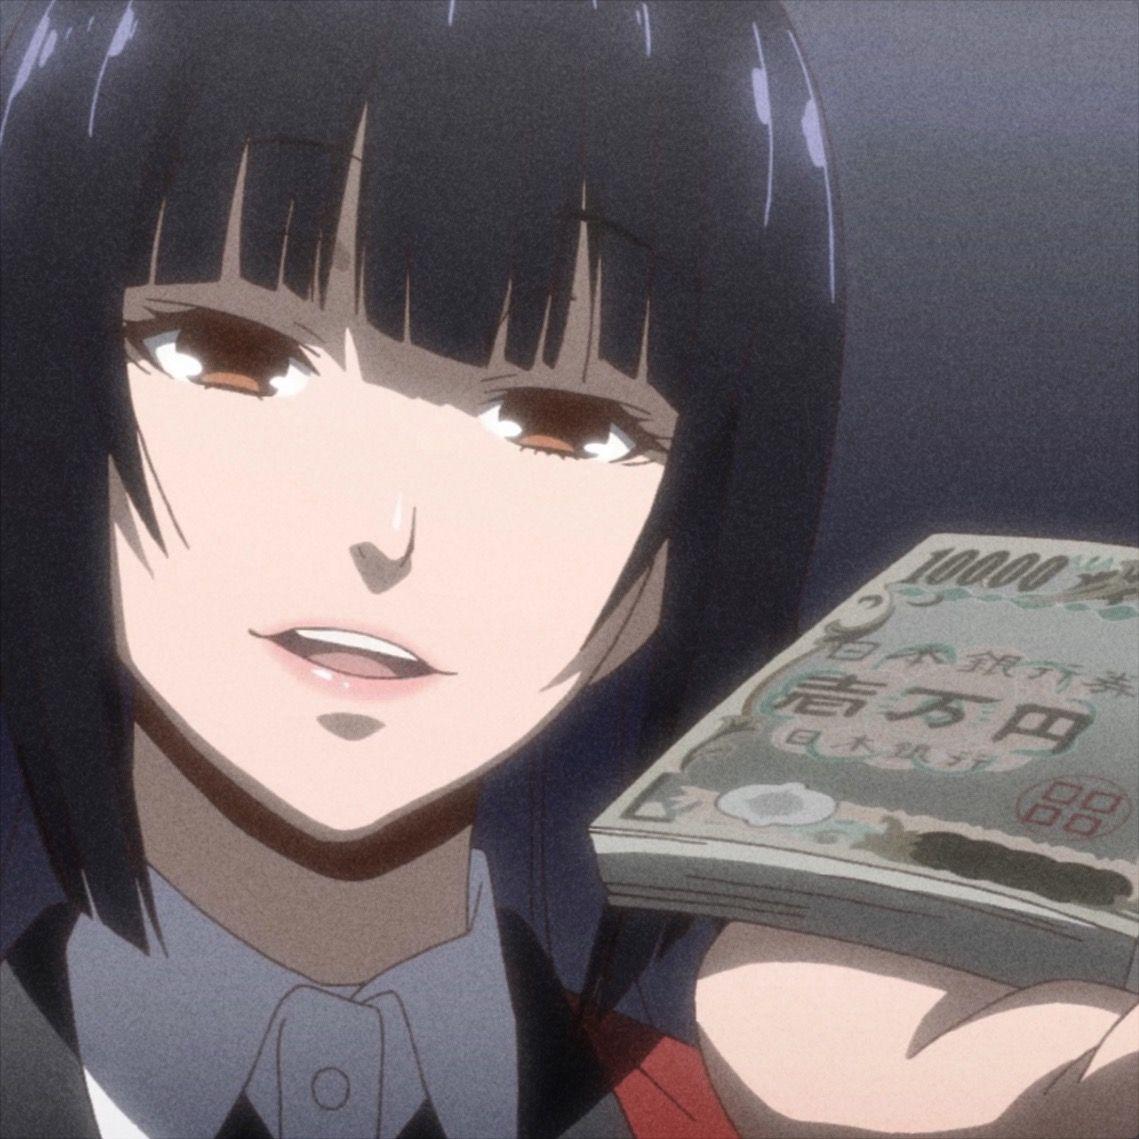 Jabami Yumeko 𝒾𝒸𝑜𝓃 ★🌙 in 2020 Cute anime character